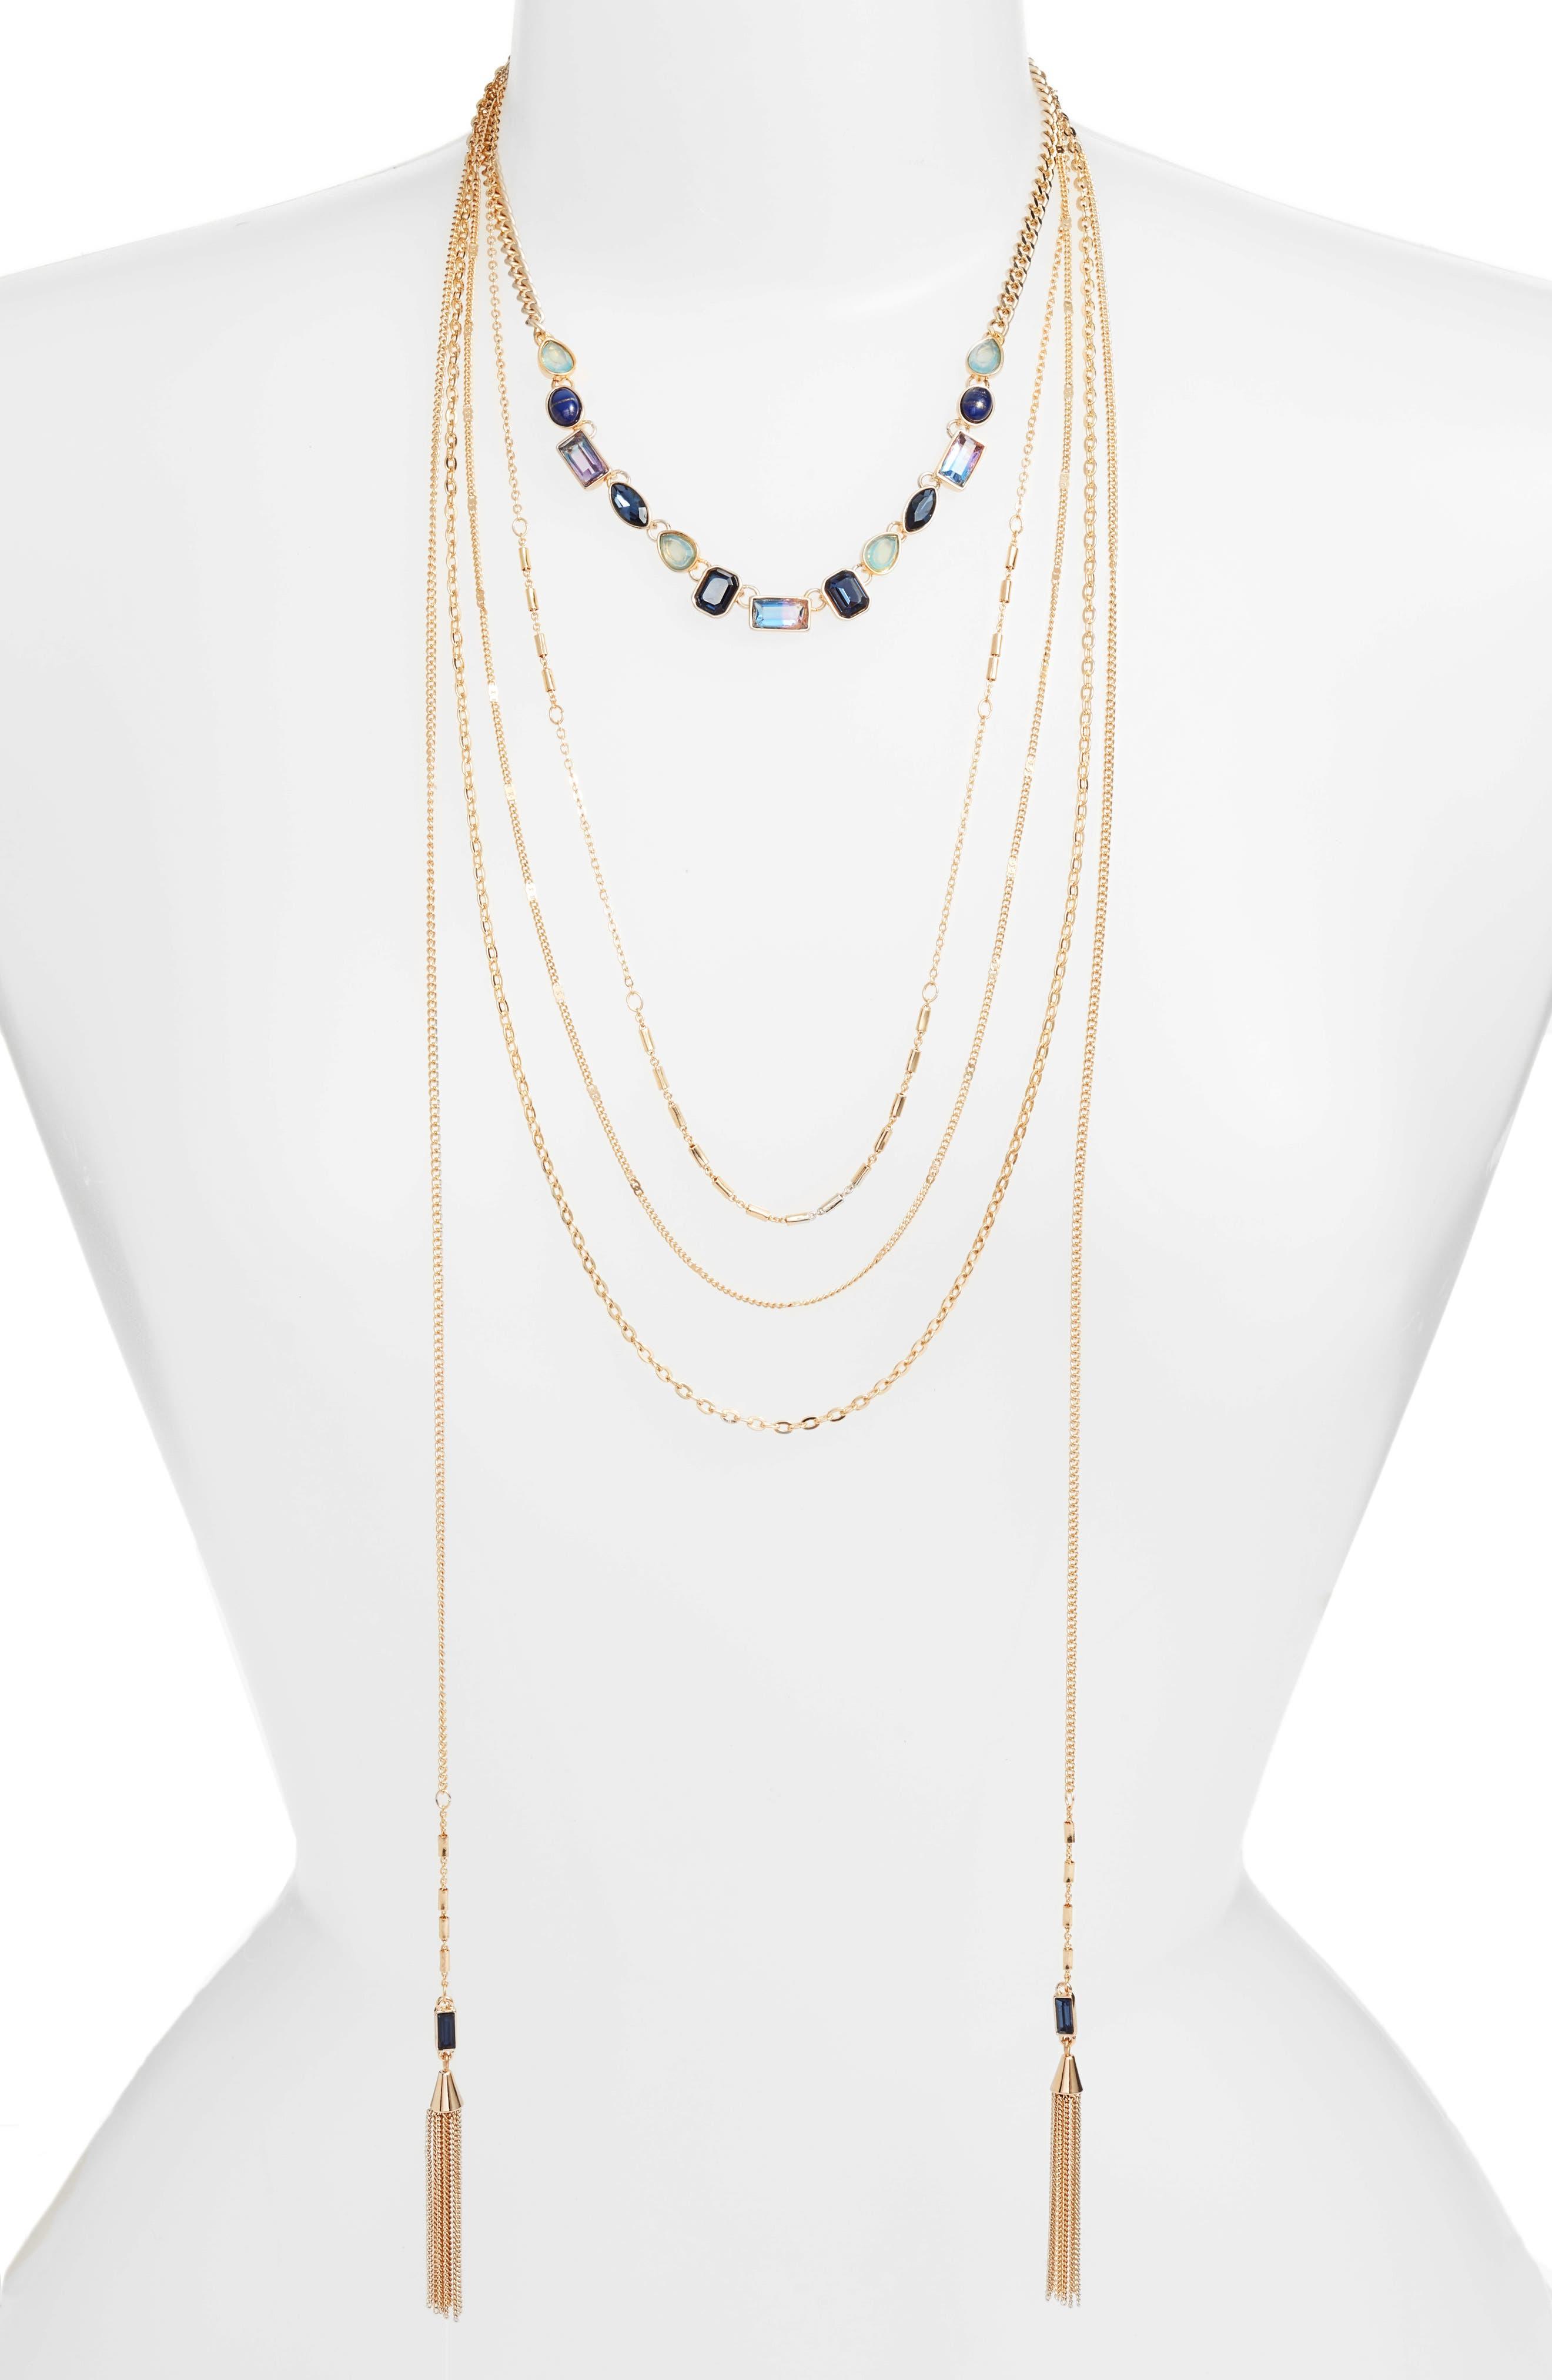 Crystal Multistrand Choker Necklace,                             Main thumbnail 1, color,                             420